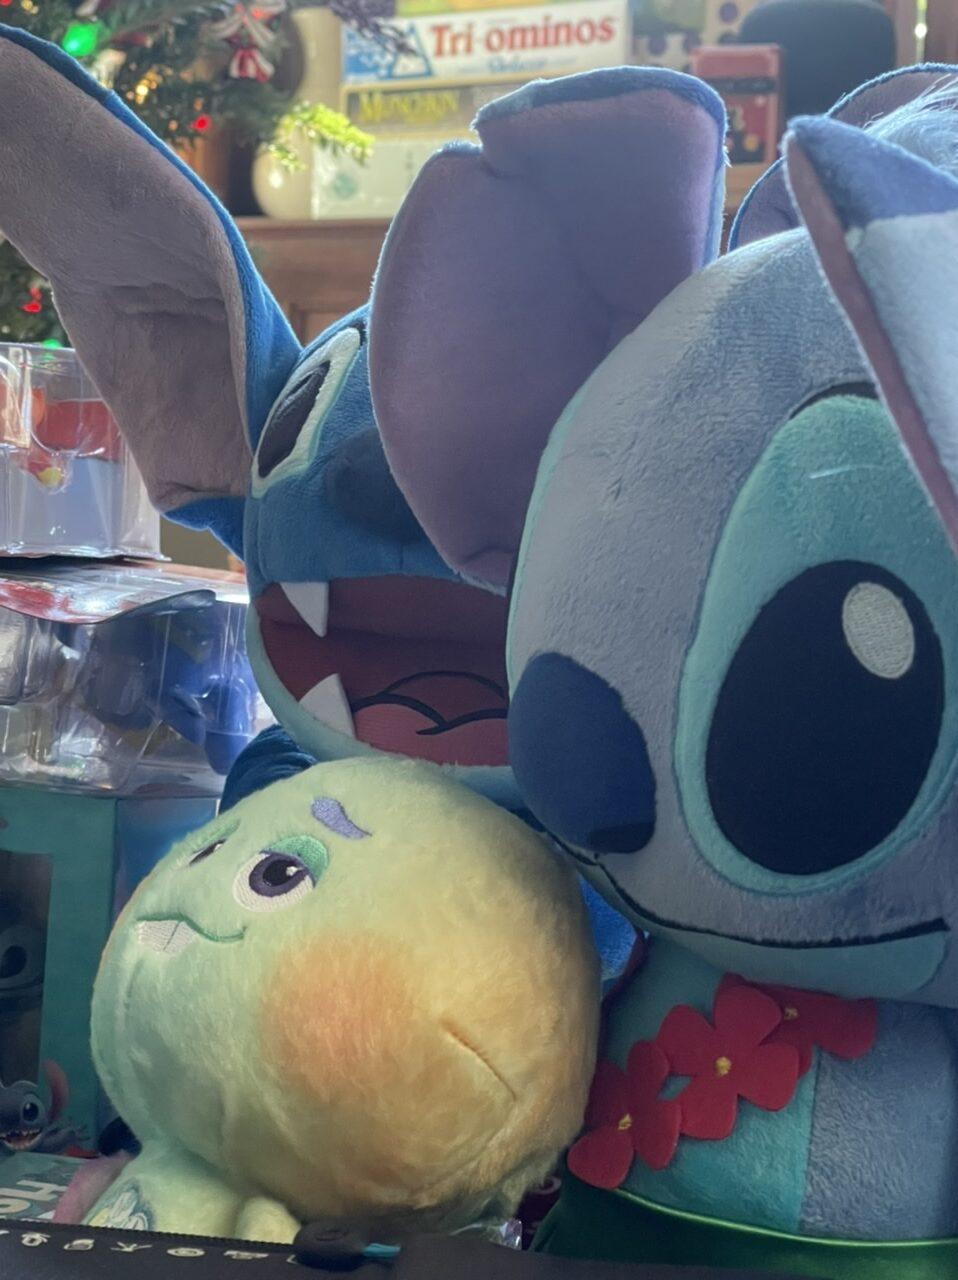 Disney Pixar Soul plush toy